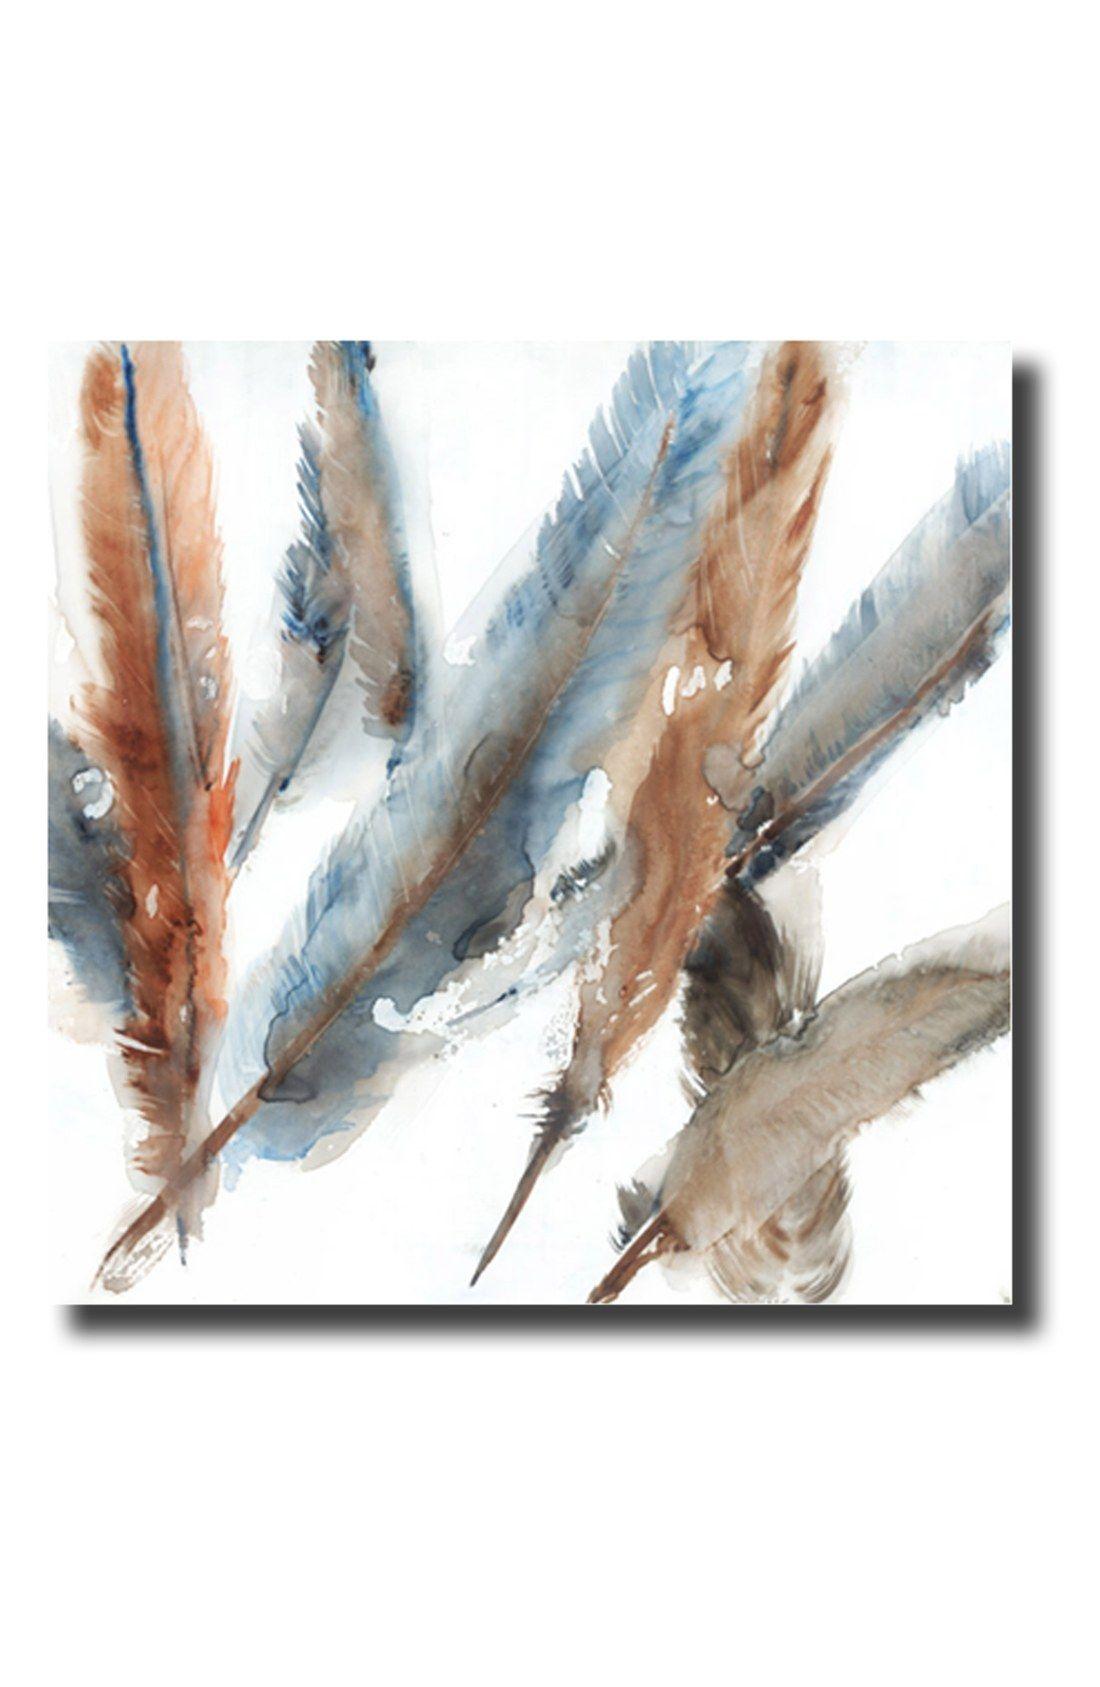 Crystal art gallery feathers high gloss canvas wall art